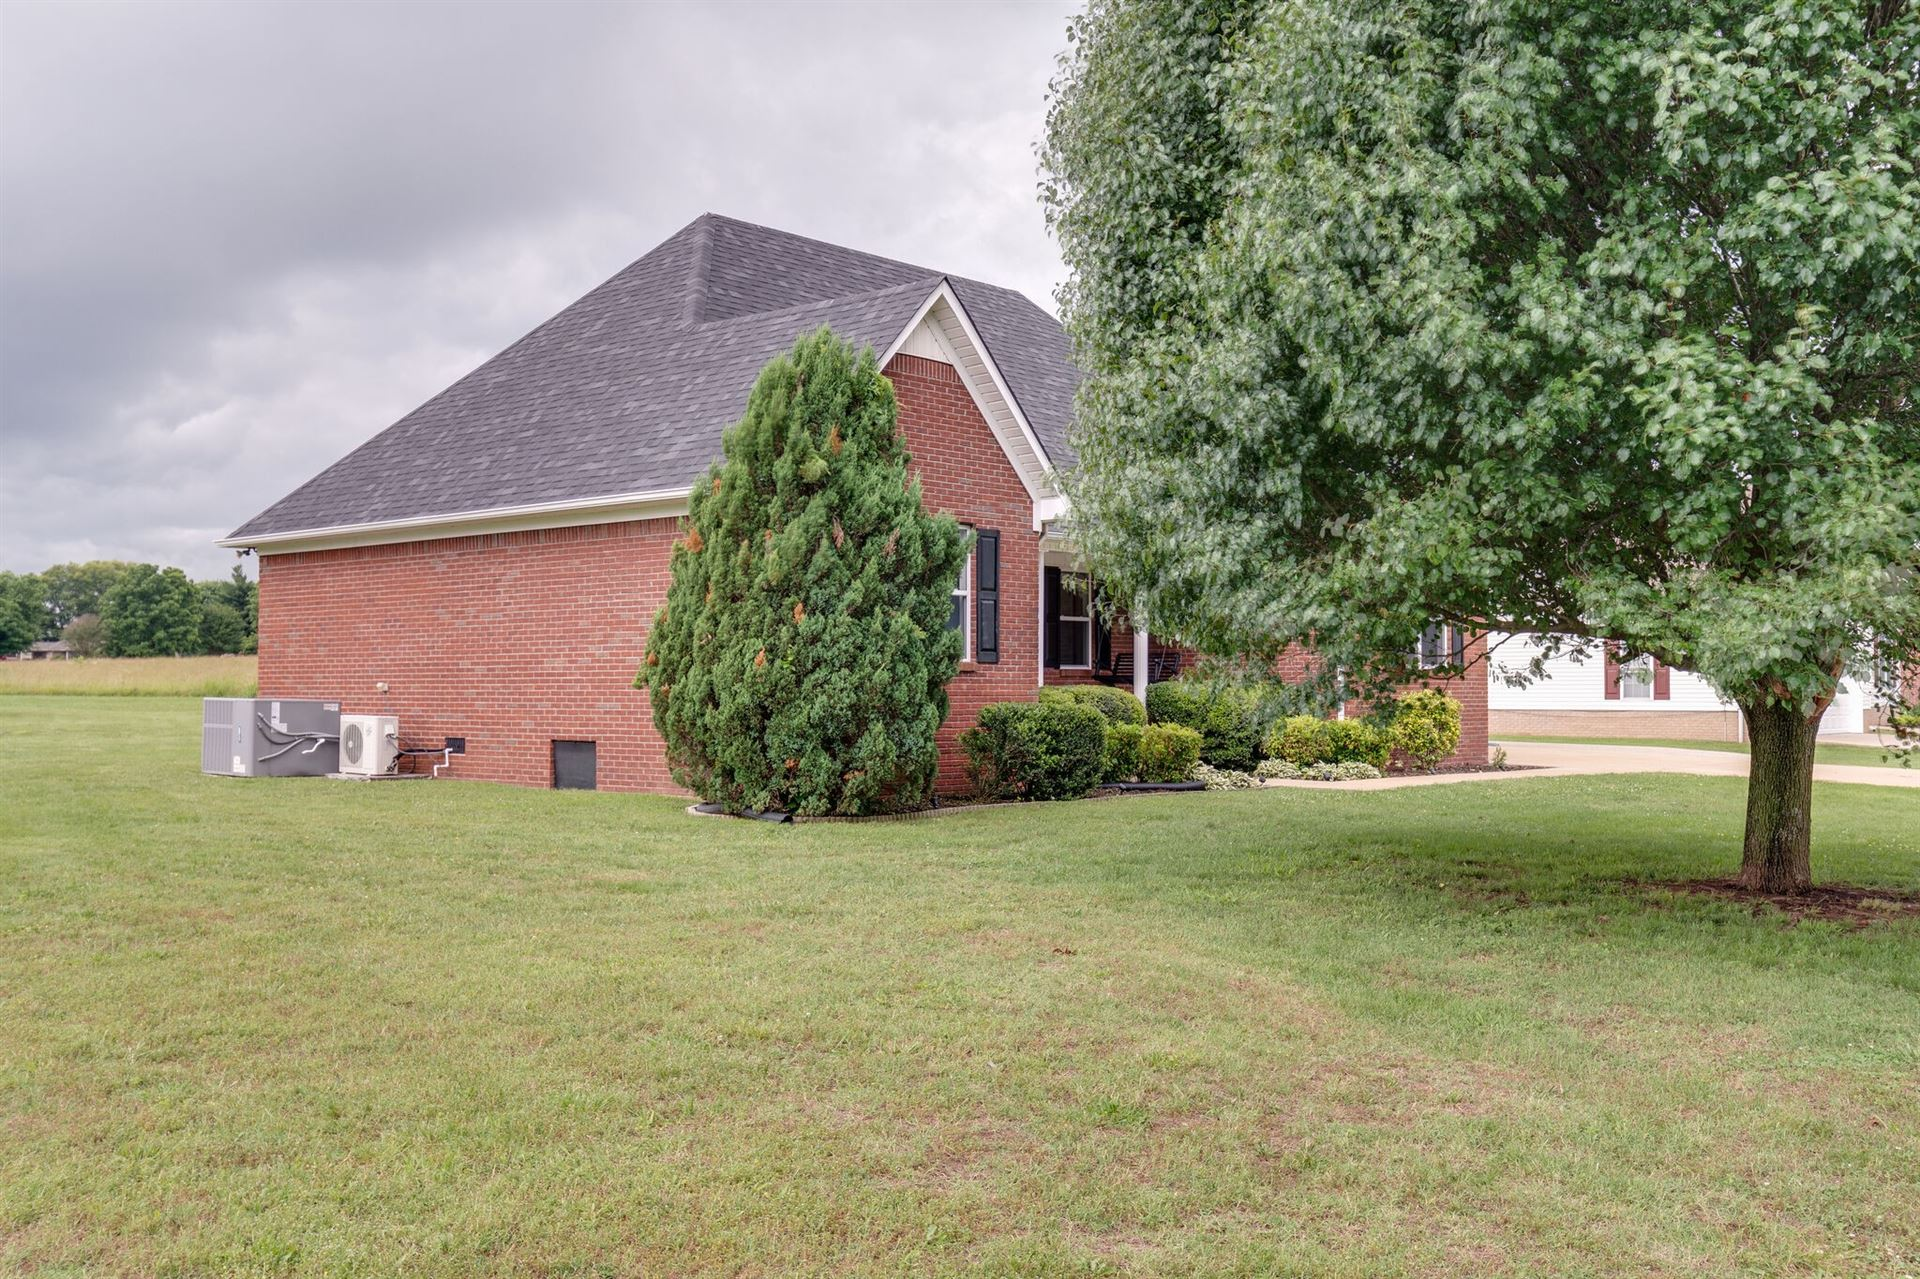 Photo of 403 Brookside Dr, Mount Pleasant, TN 38474 (MLS # 2169303)